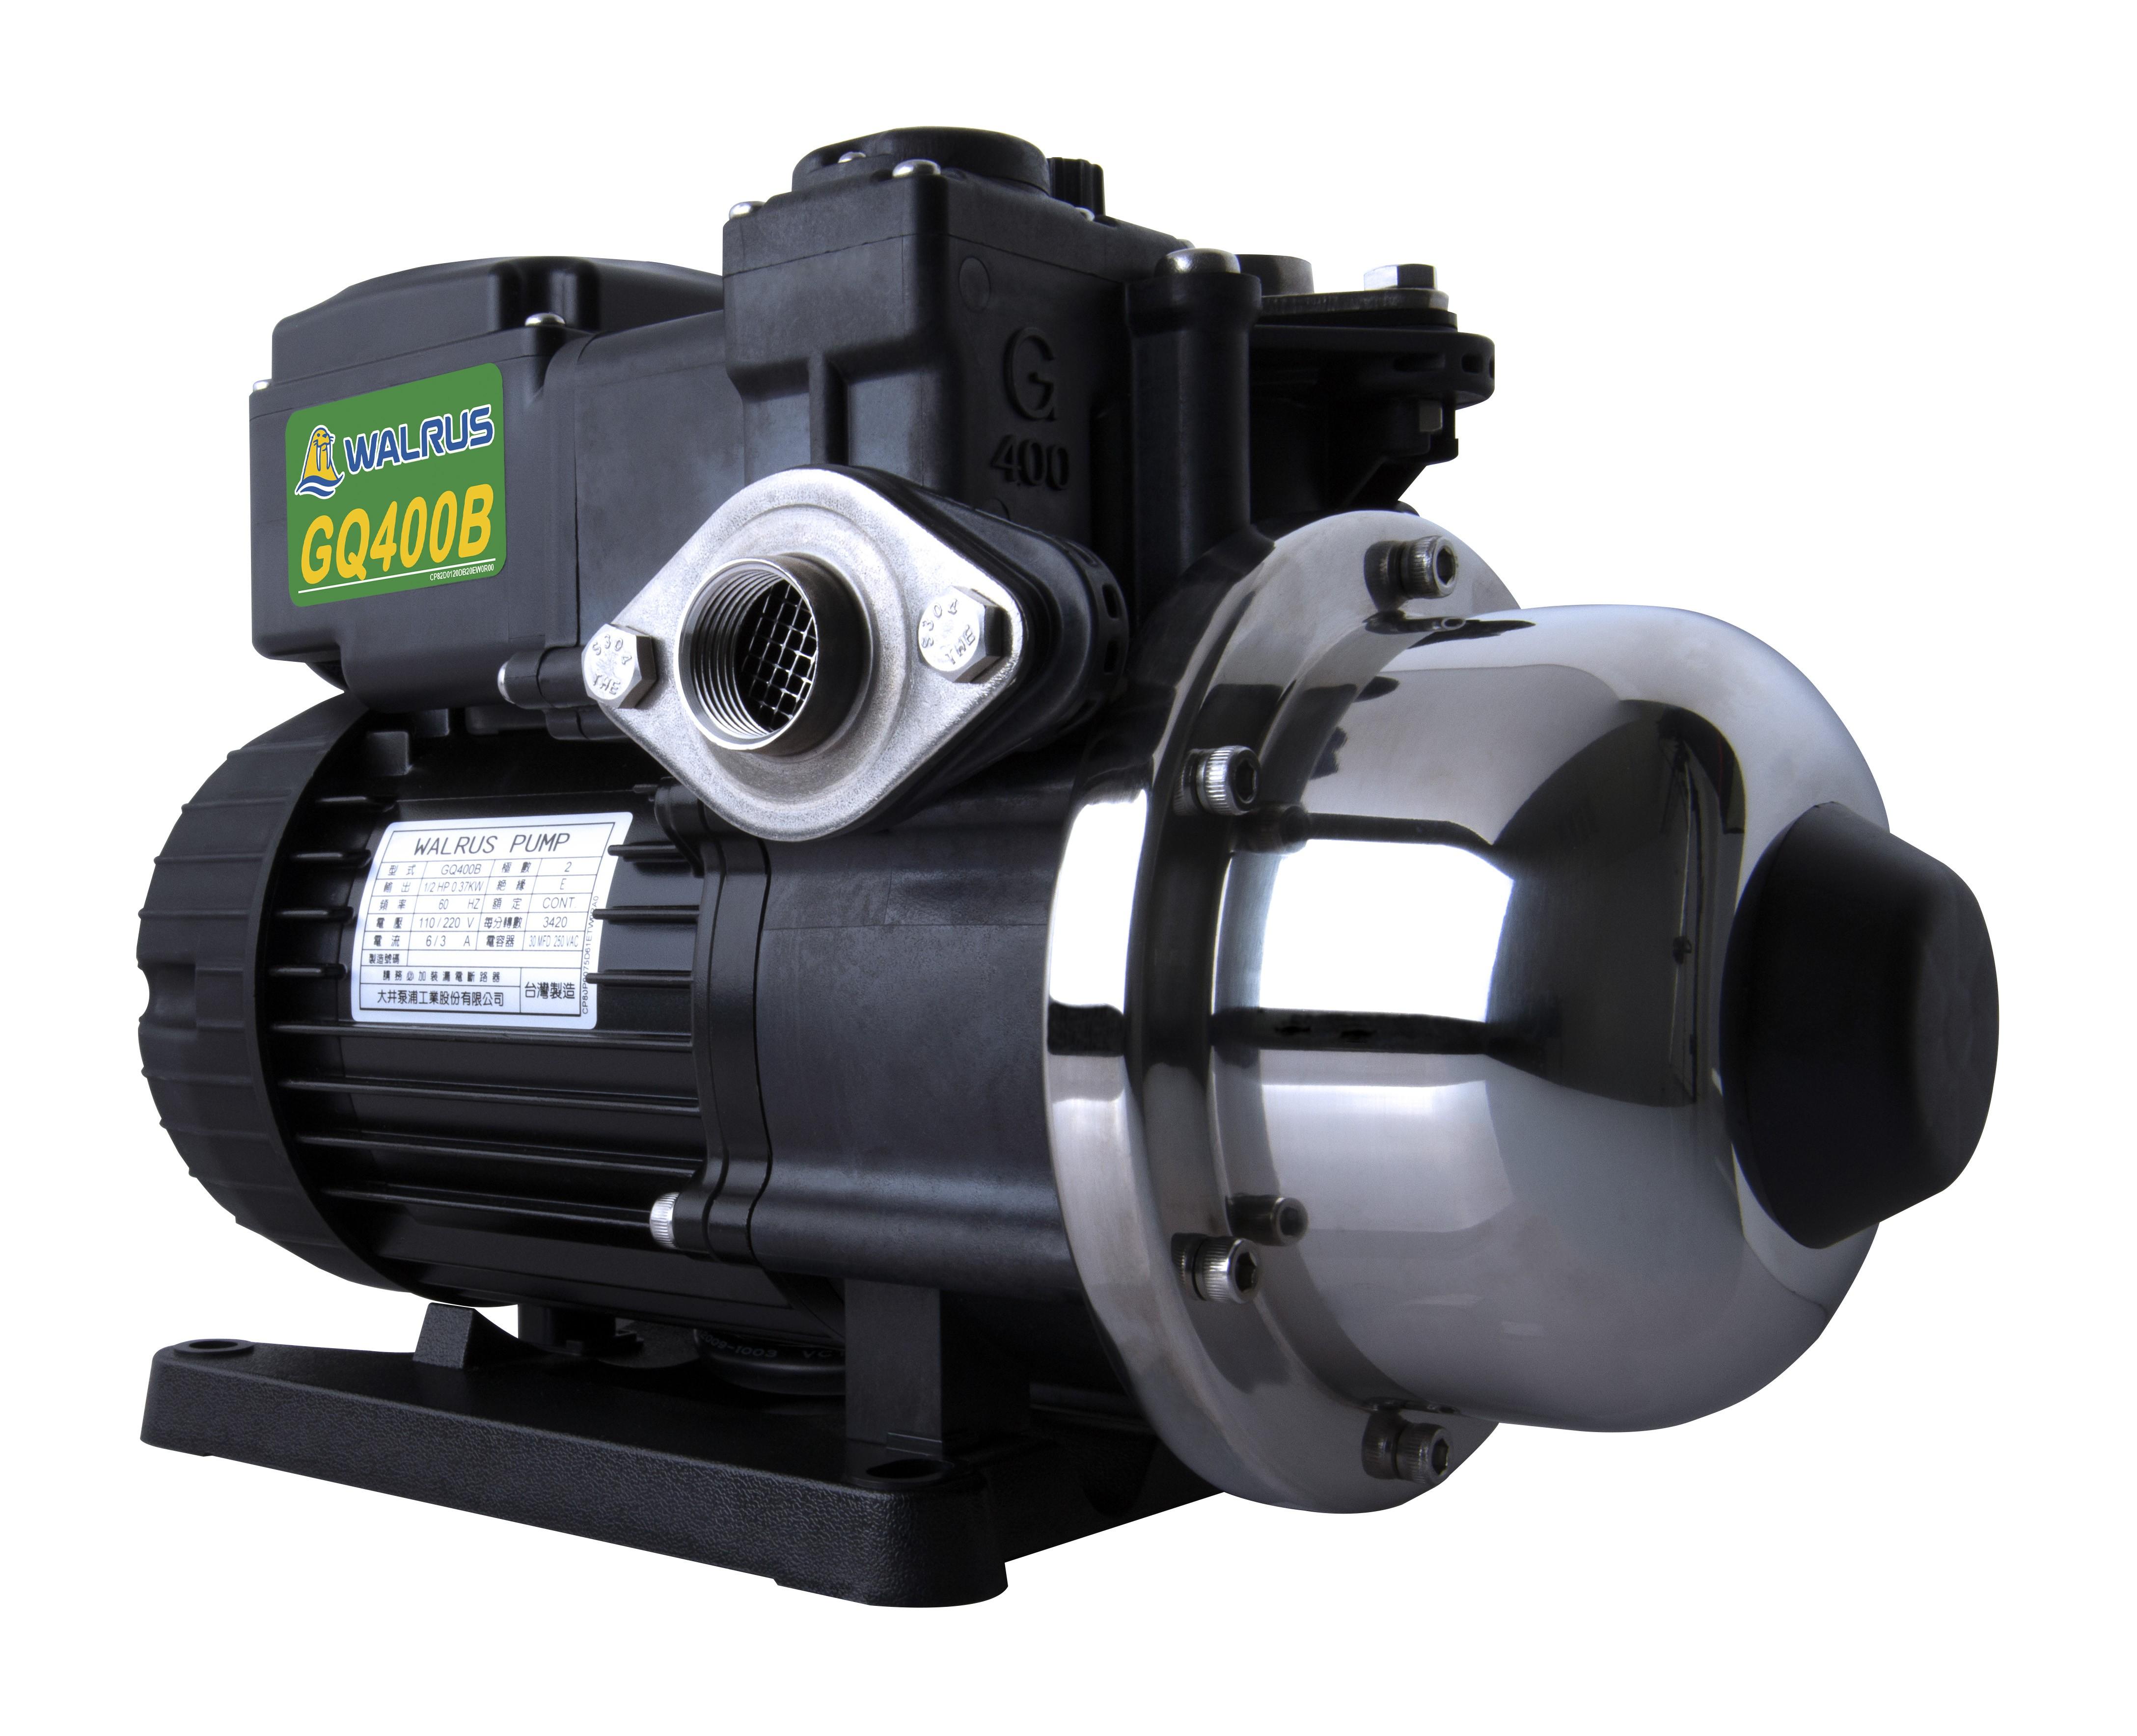 GQ系列專用加壓機-大井泵浦工業股份有限公司